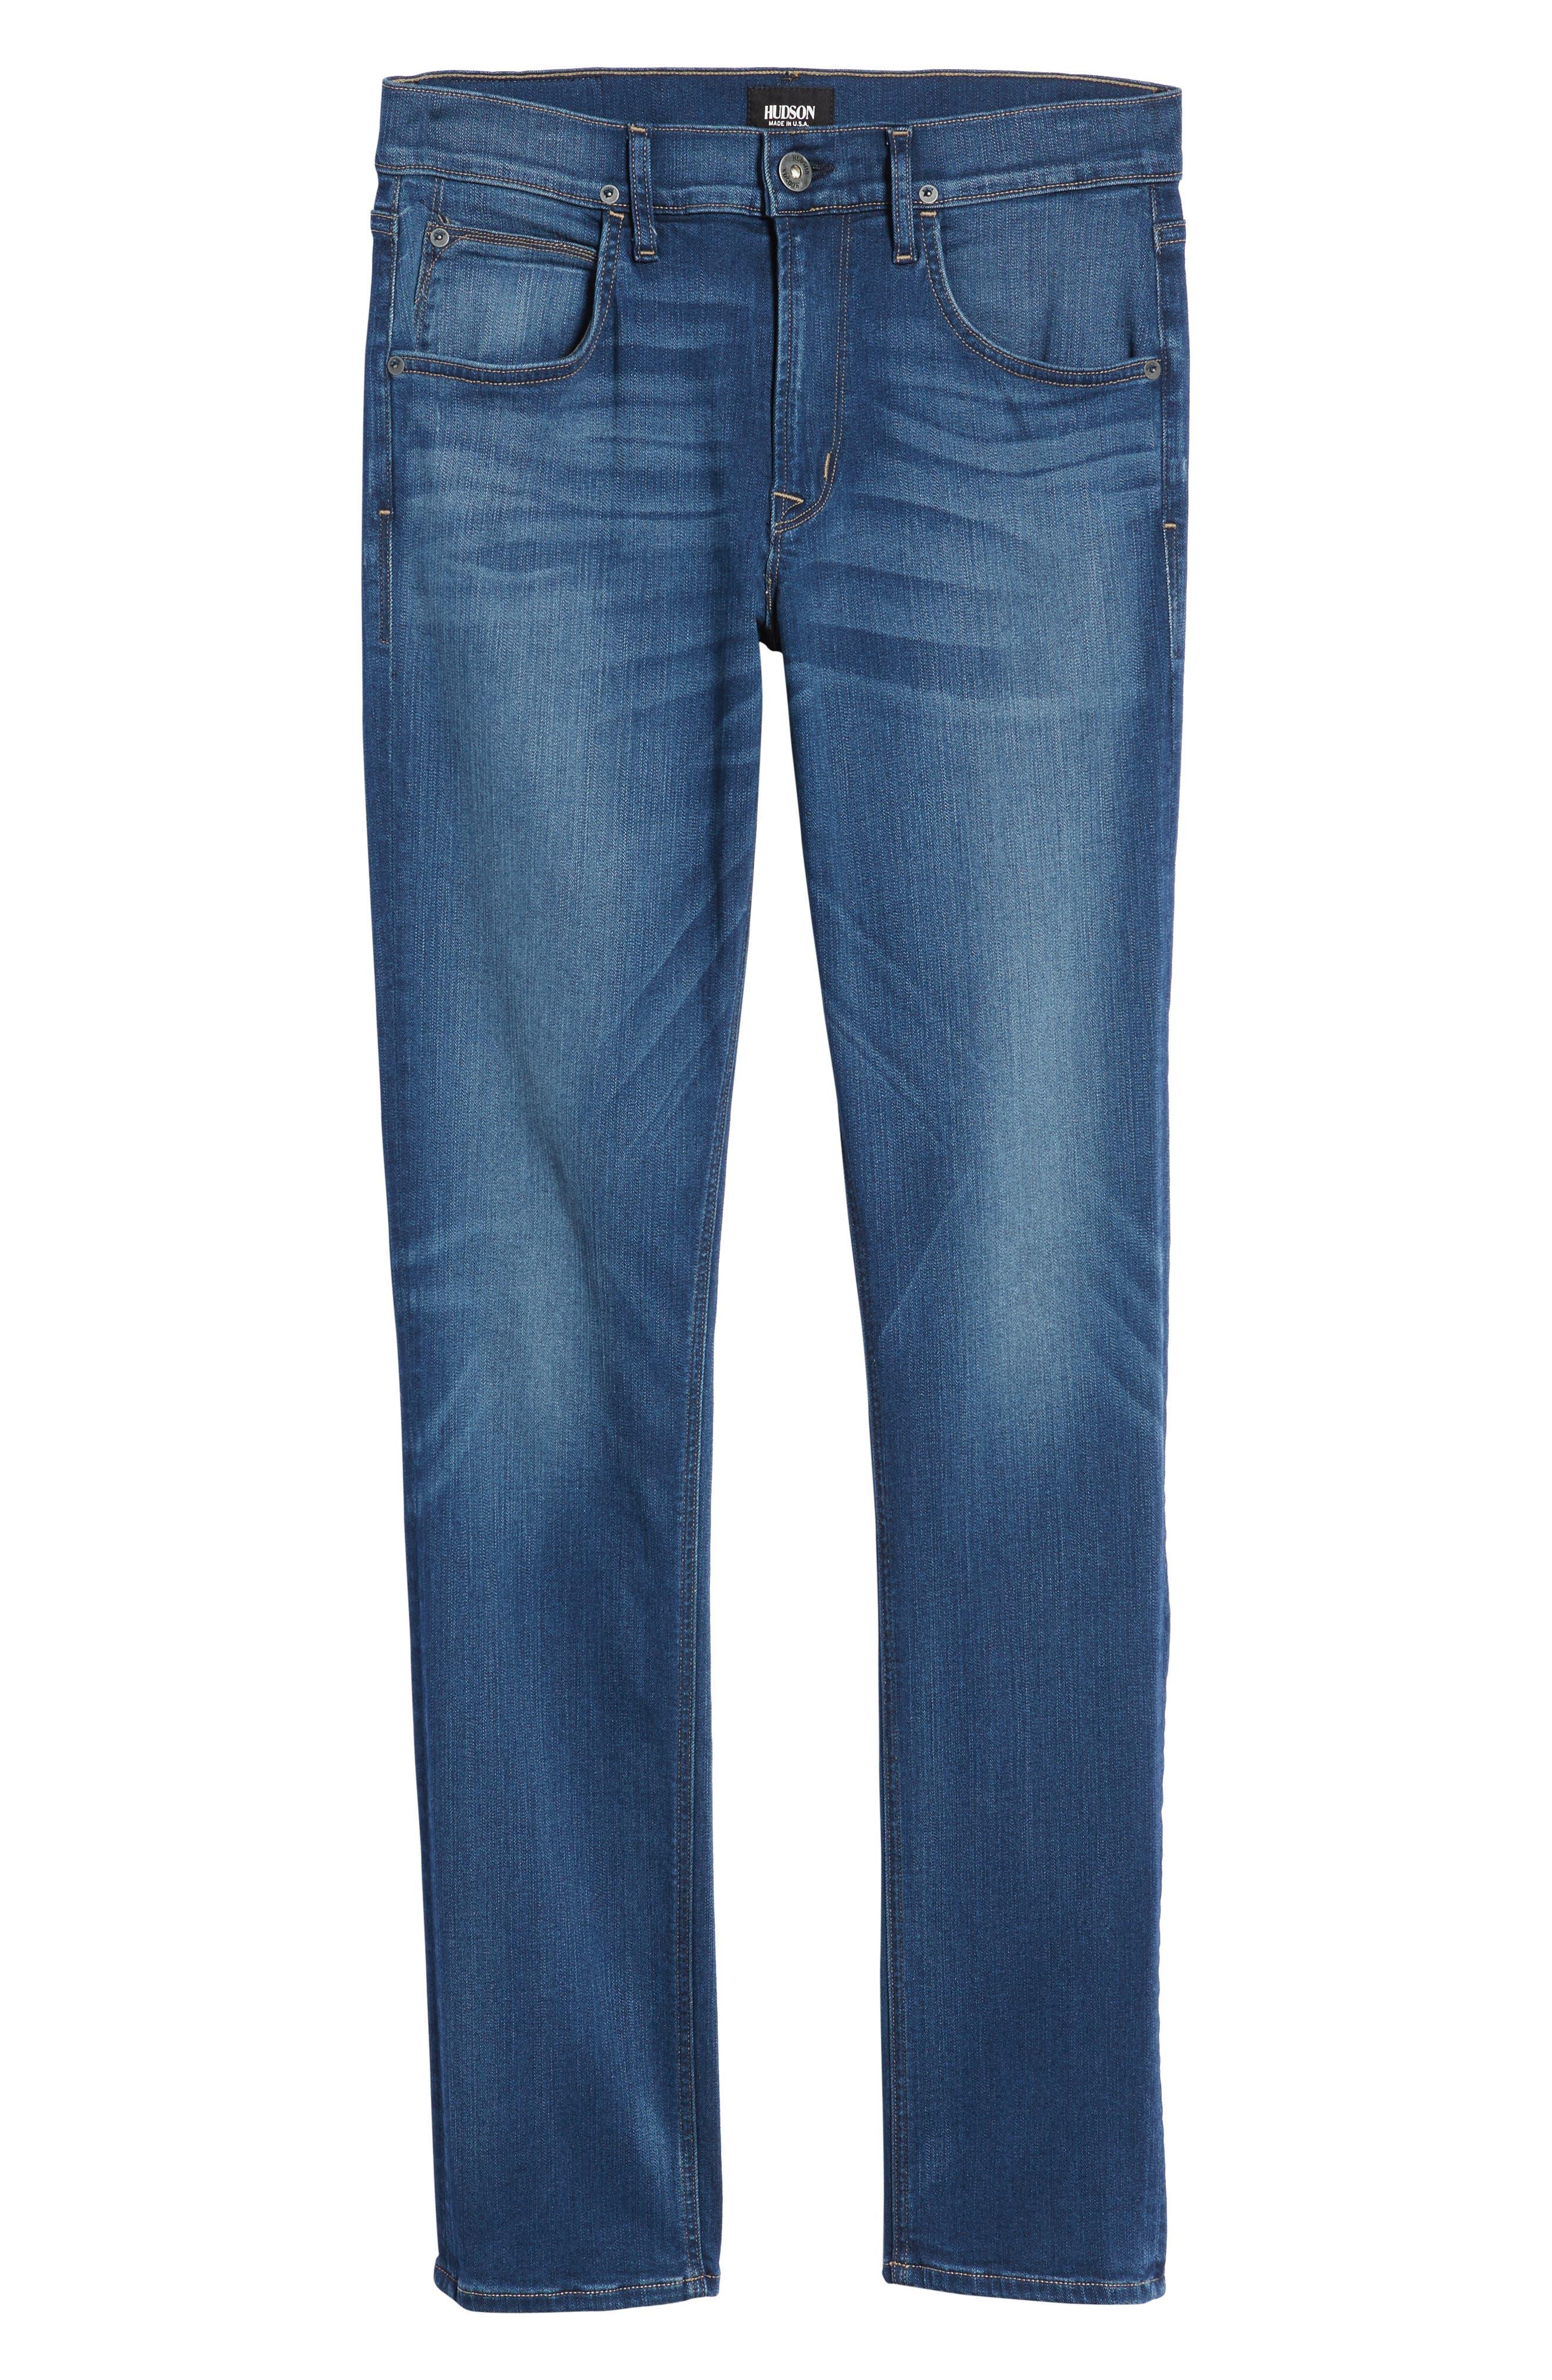 Hudson Blake Slim Fit Jeans,                             Alternate thumbnail 6, color,                             Independent